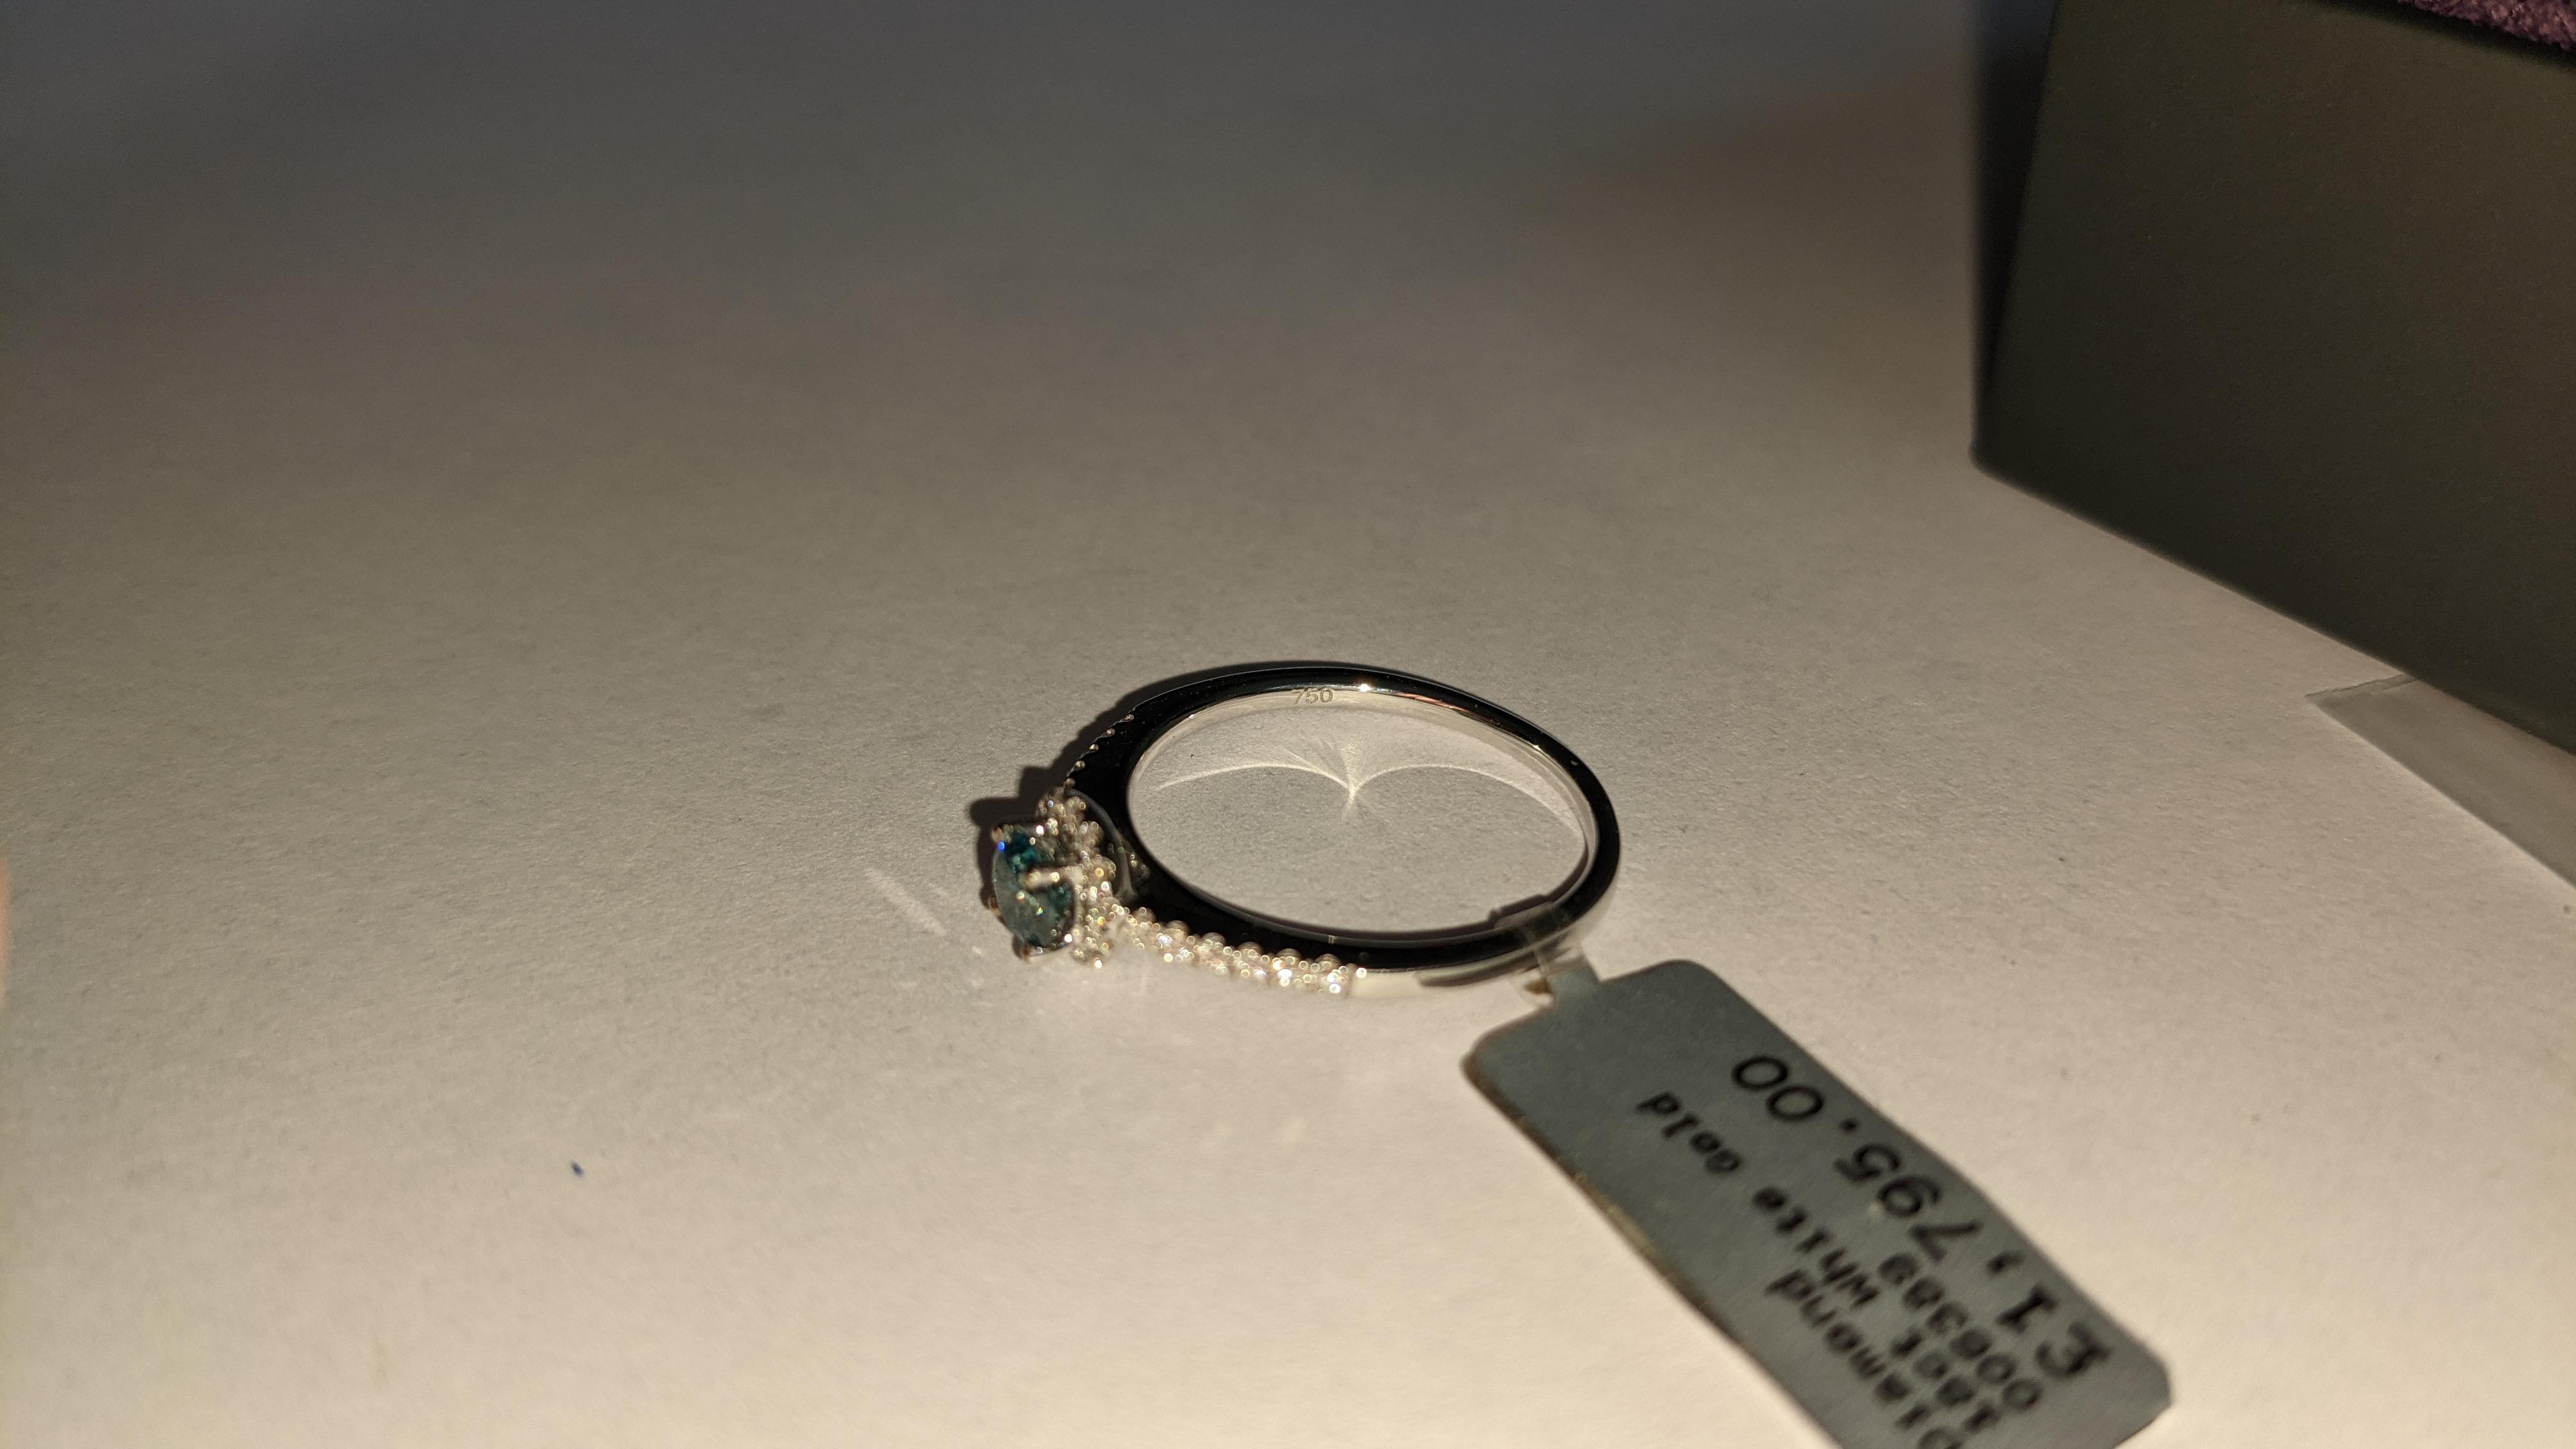 18ct white gold & diamond ring with 0.30ct blue diamond & 0.1ct of additional diamonds around the ce - Image 12 of 19